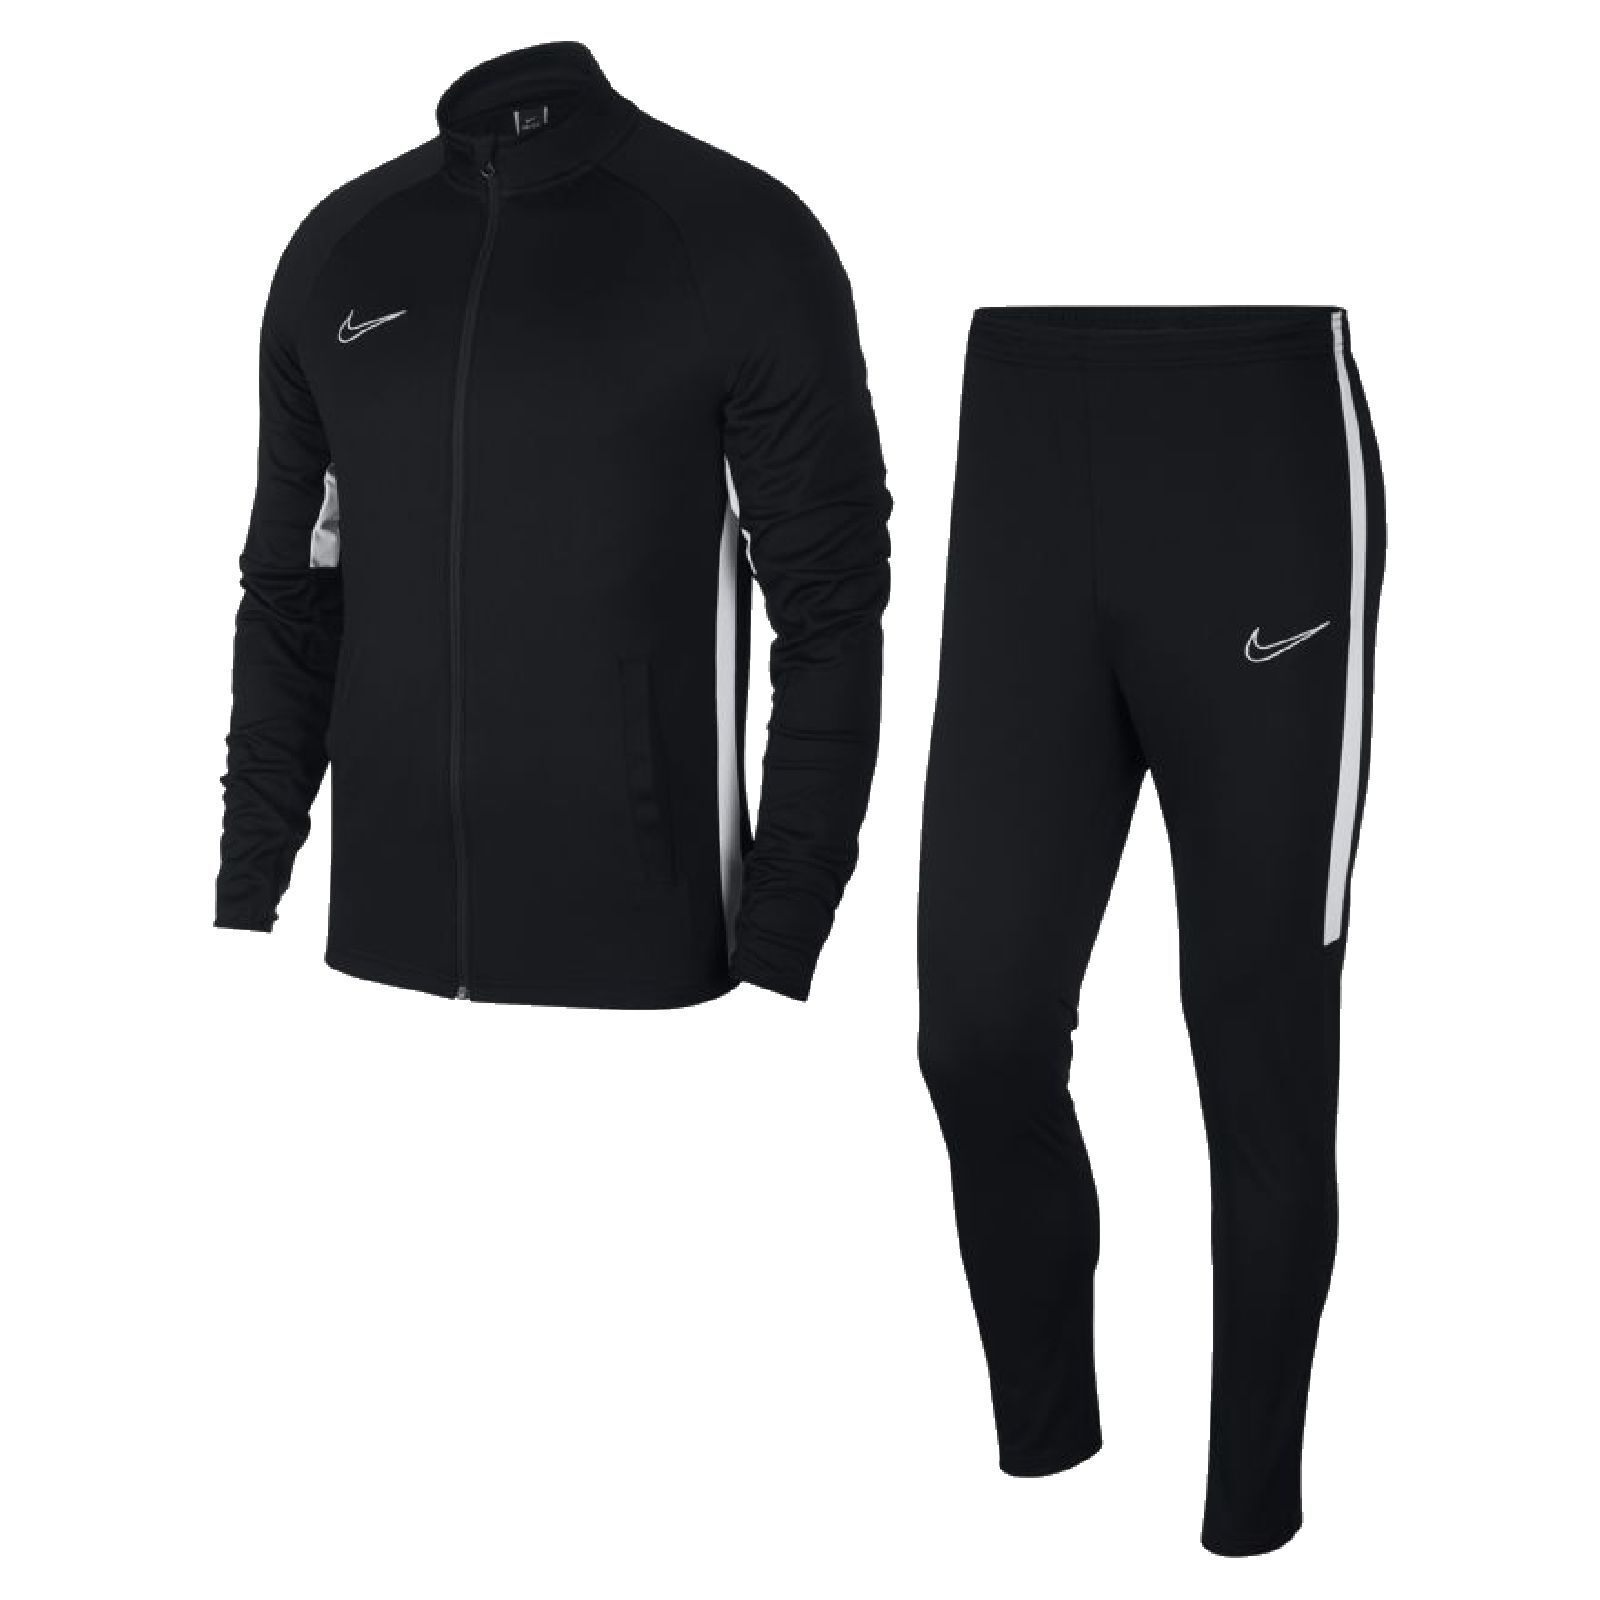 Nike señores fútbol chándal dri-fit Academy olimpica negro blancoo   gran descuento